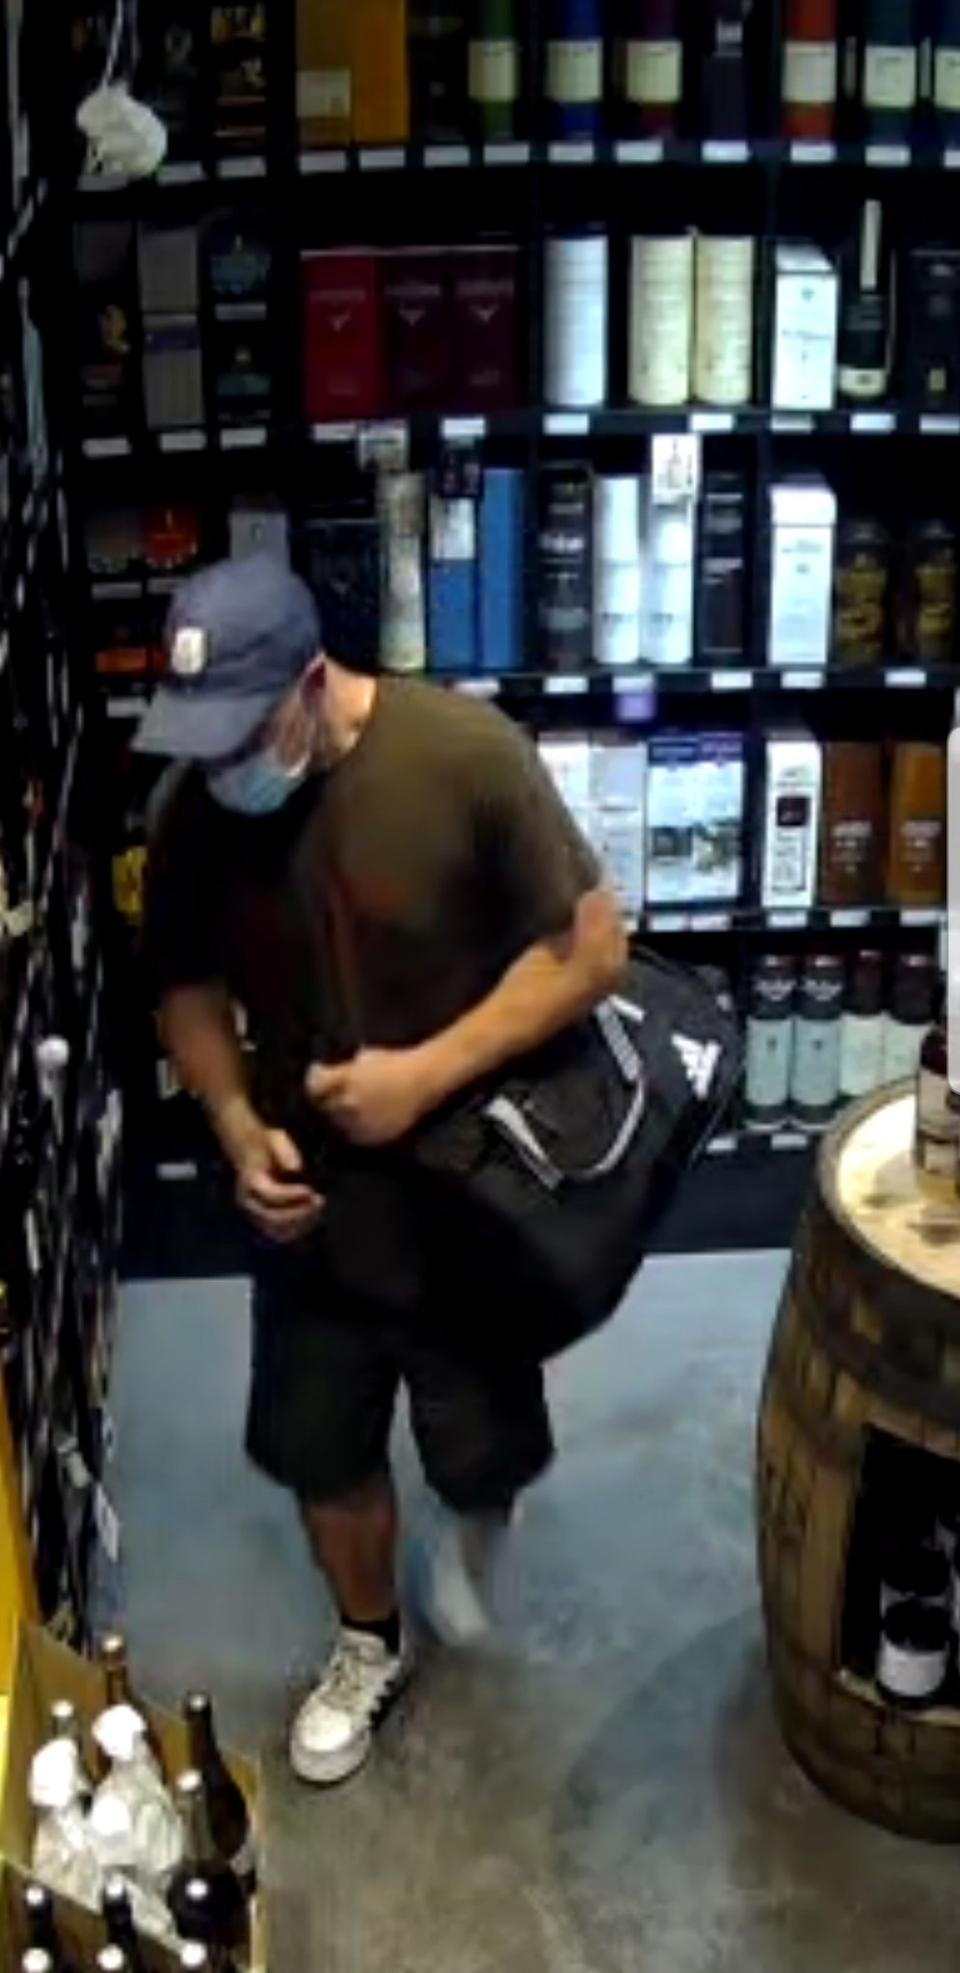 ob liquor theft